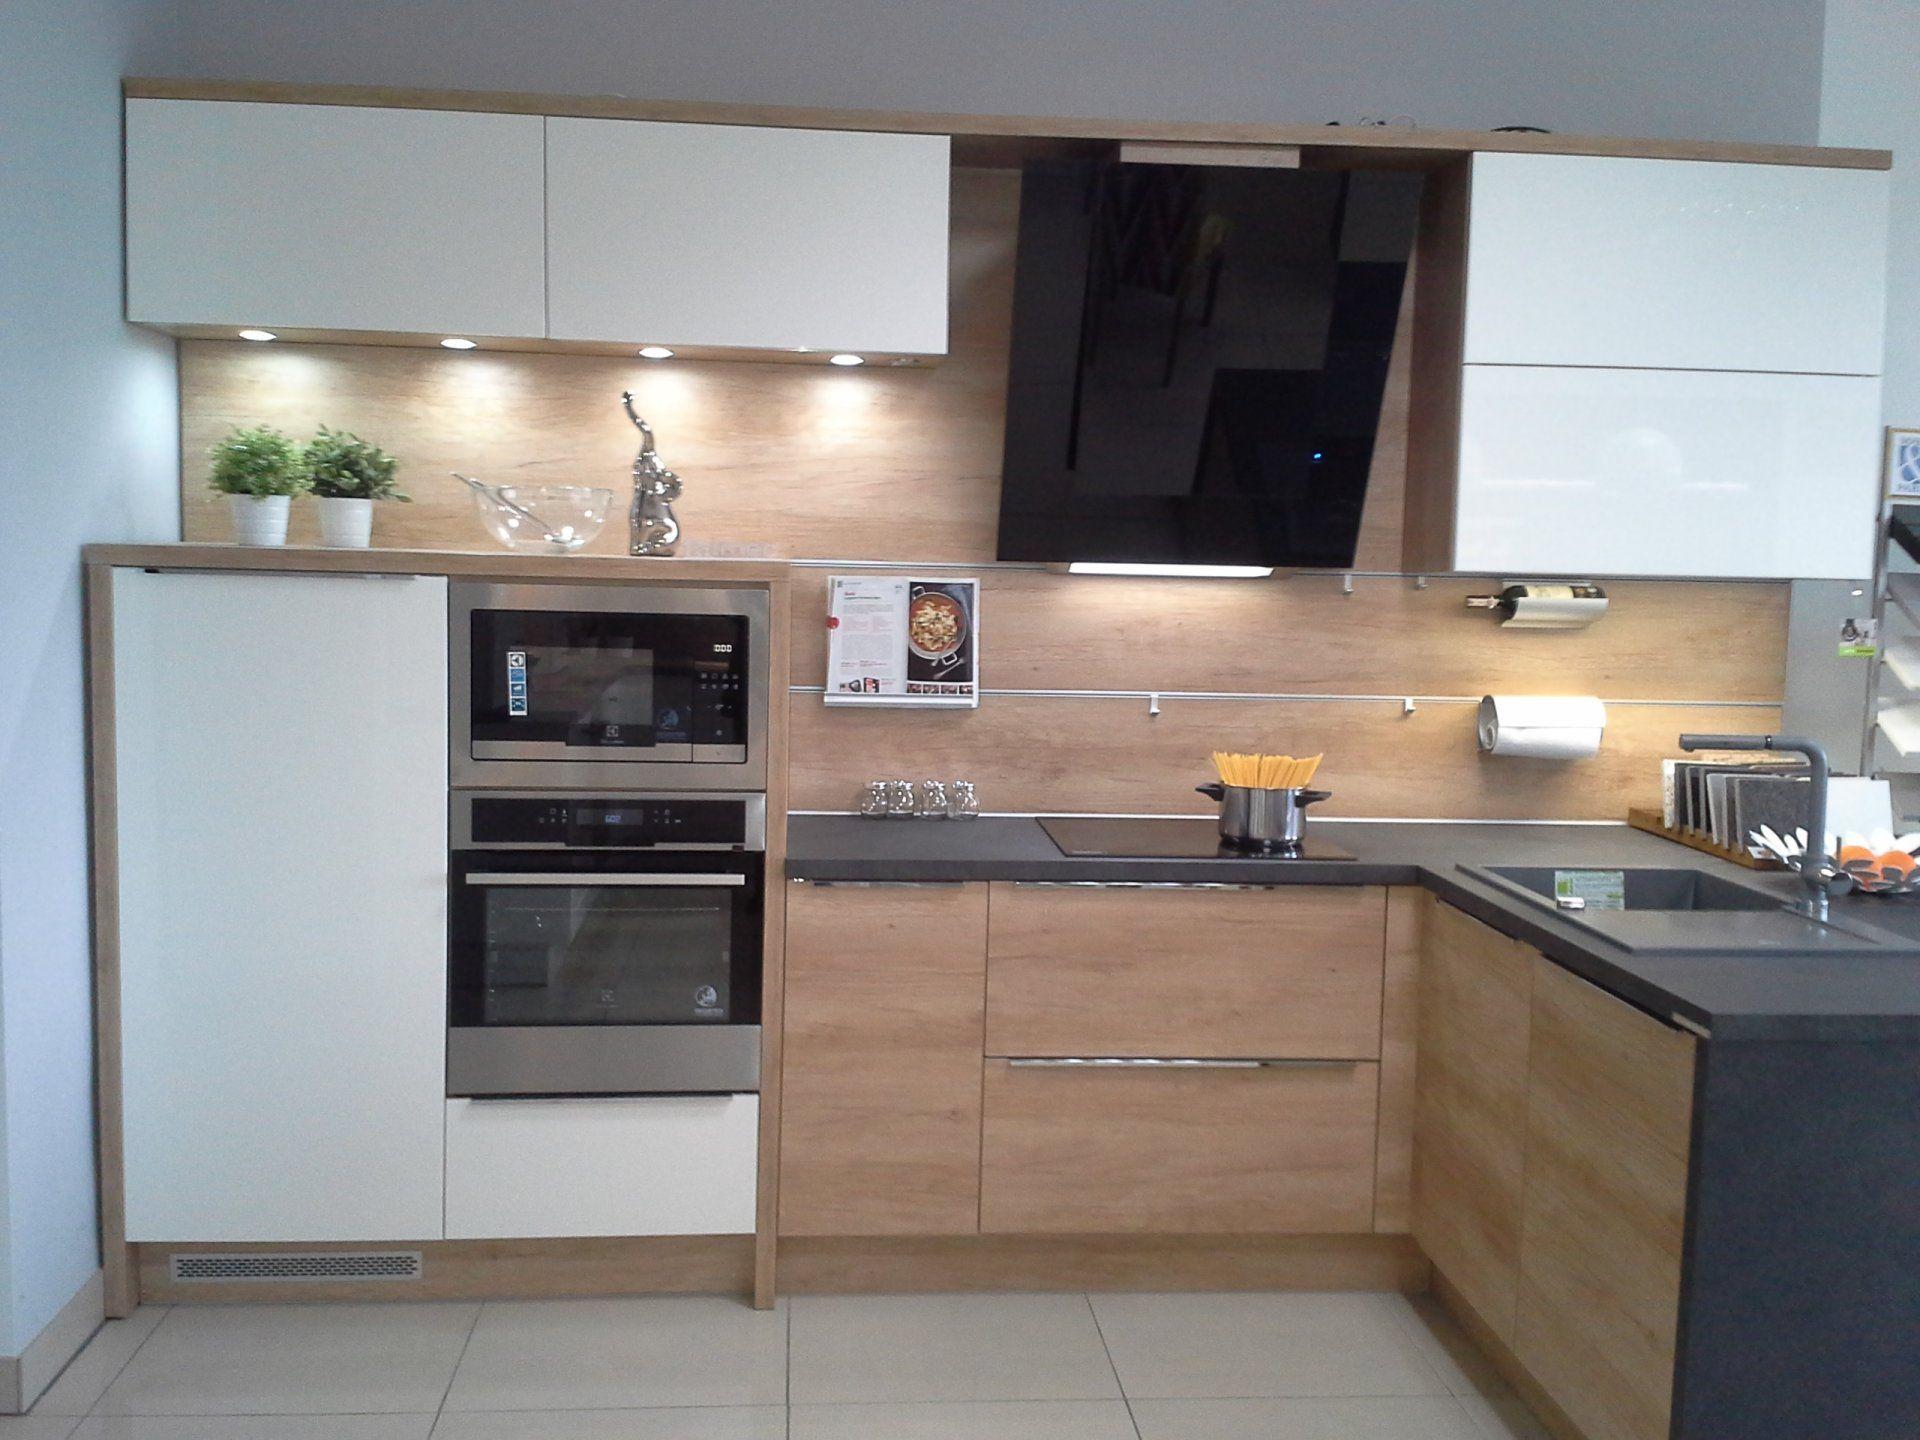 Kuchnia Nowoczesna Wfm Calma Bialy Polysk Punto Nebraska Kitchen Cabinets Kitchen Home